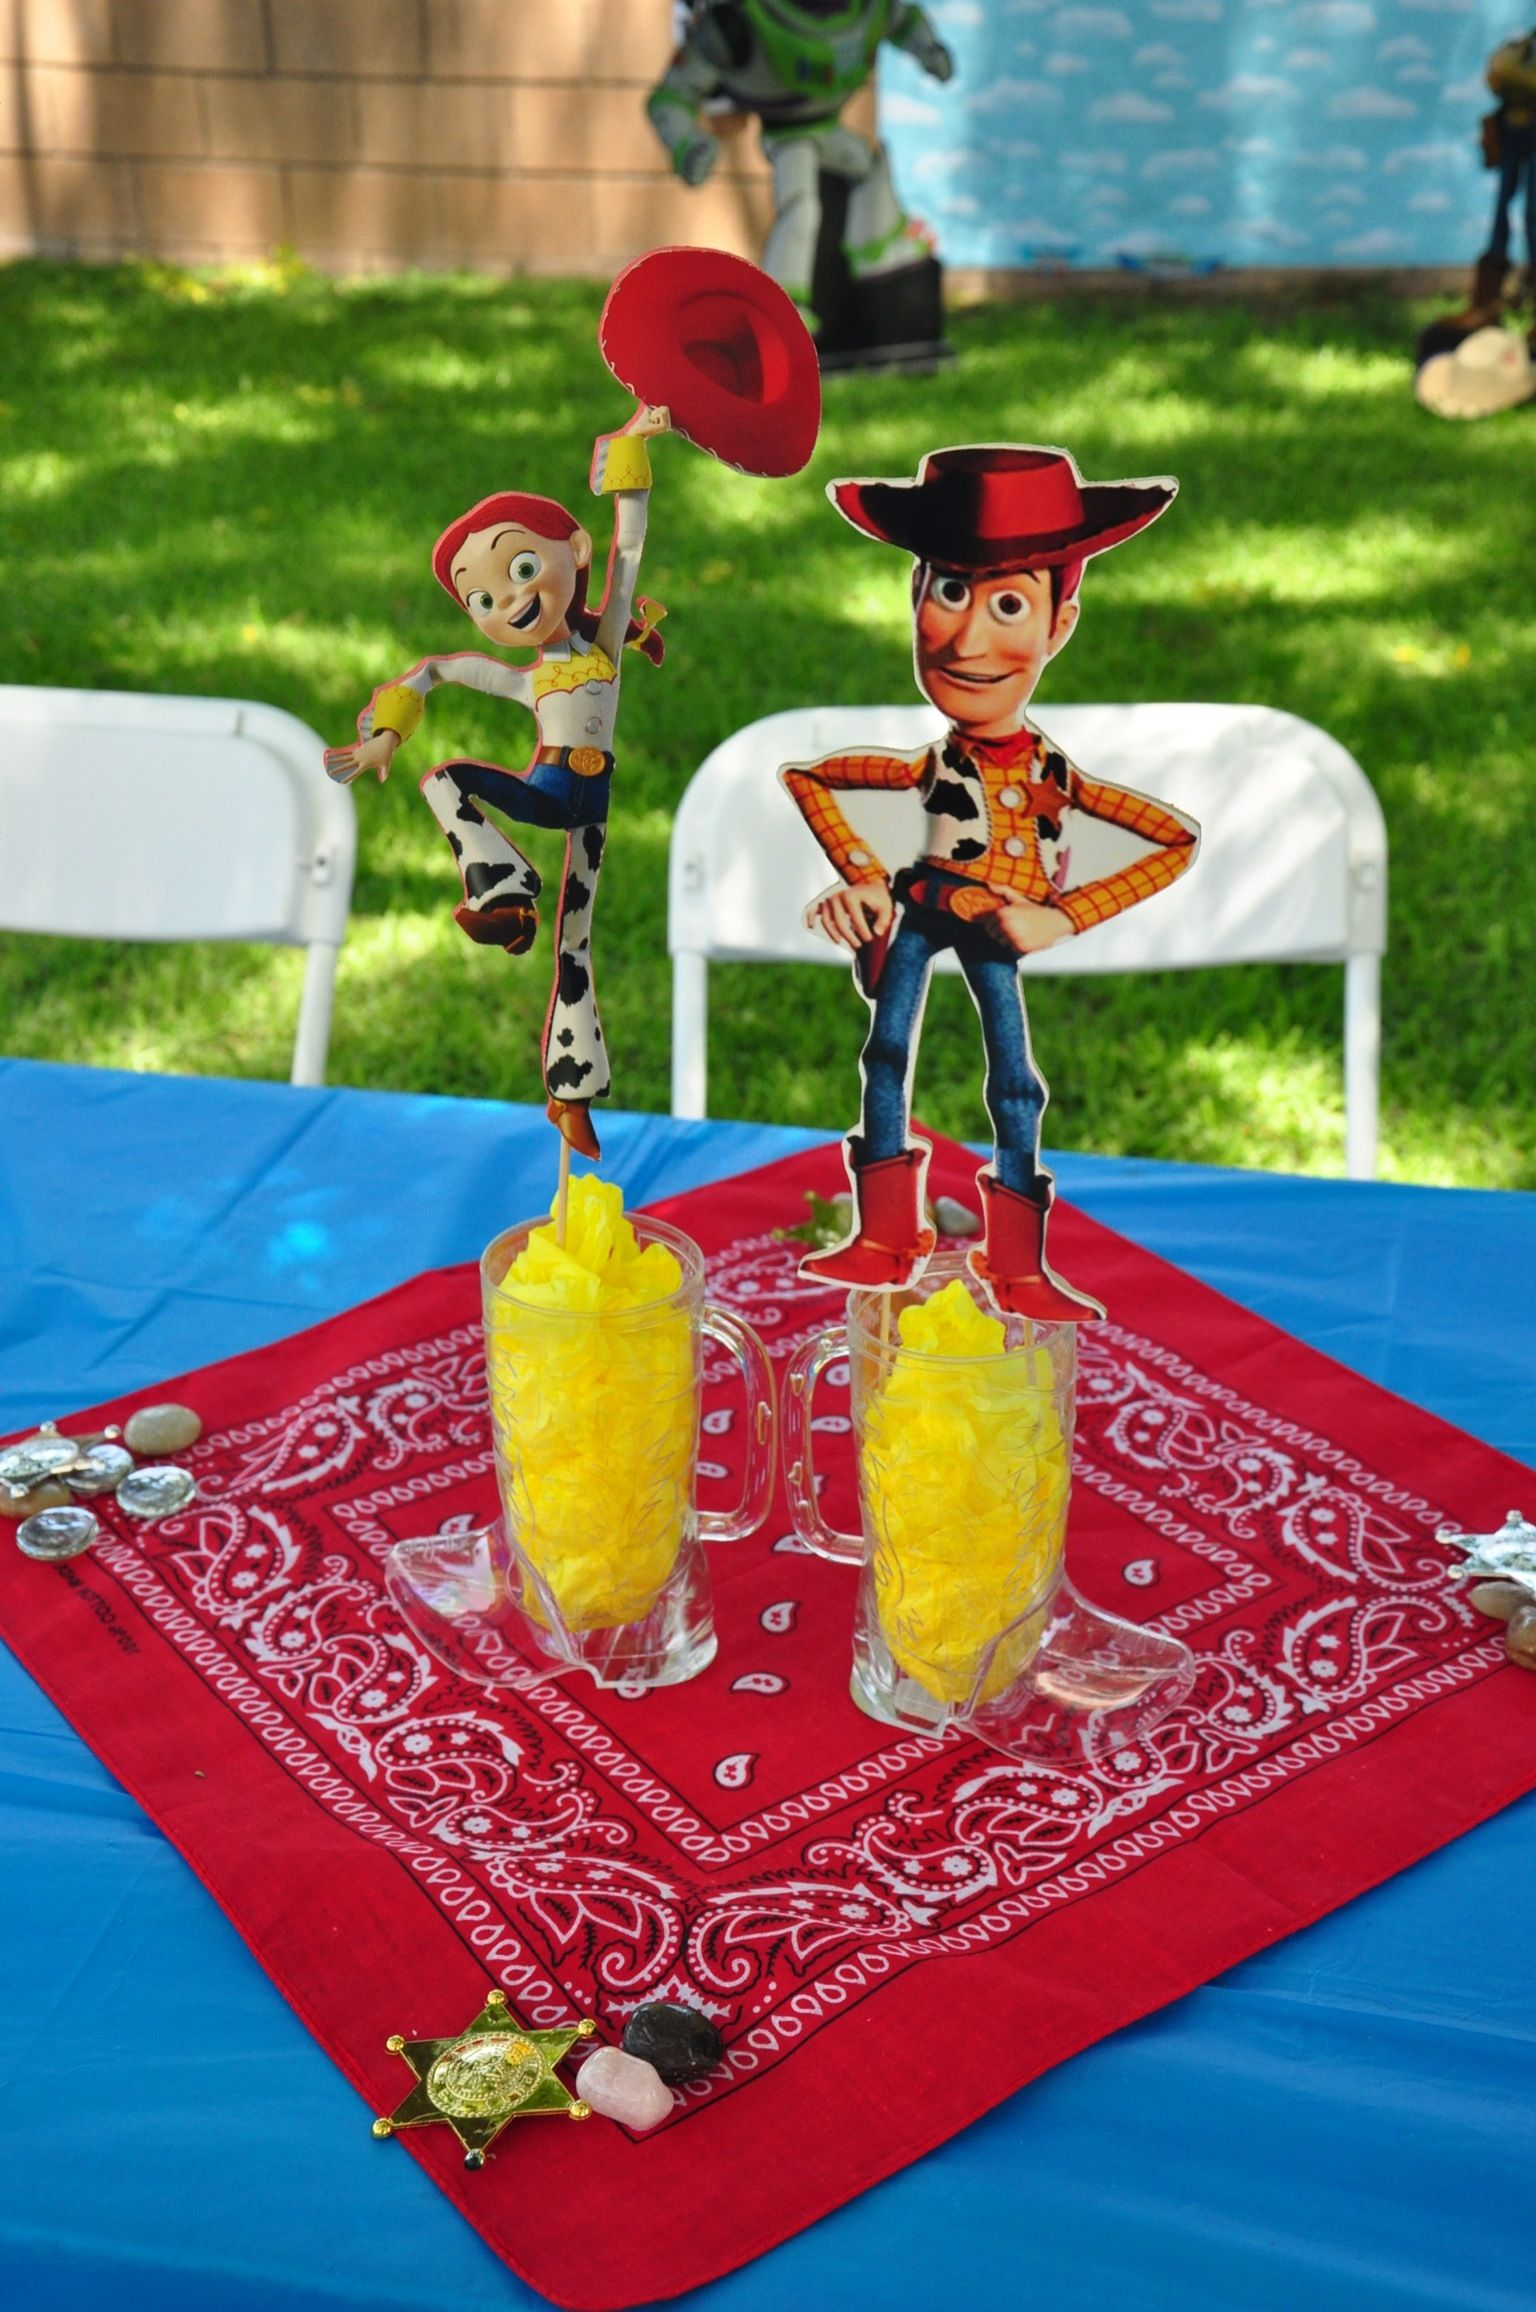 Toy story centerpiece My craft projects Pinterest